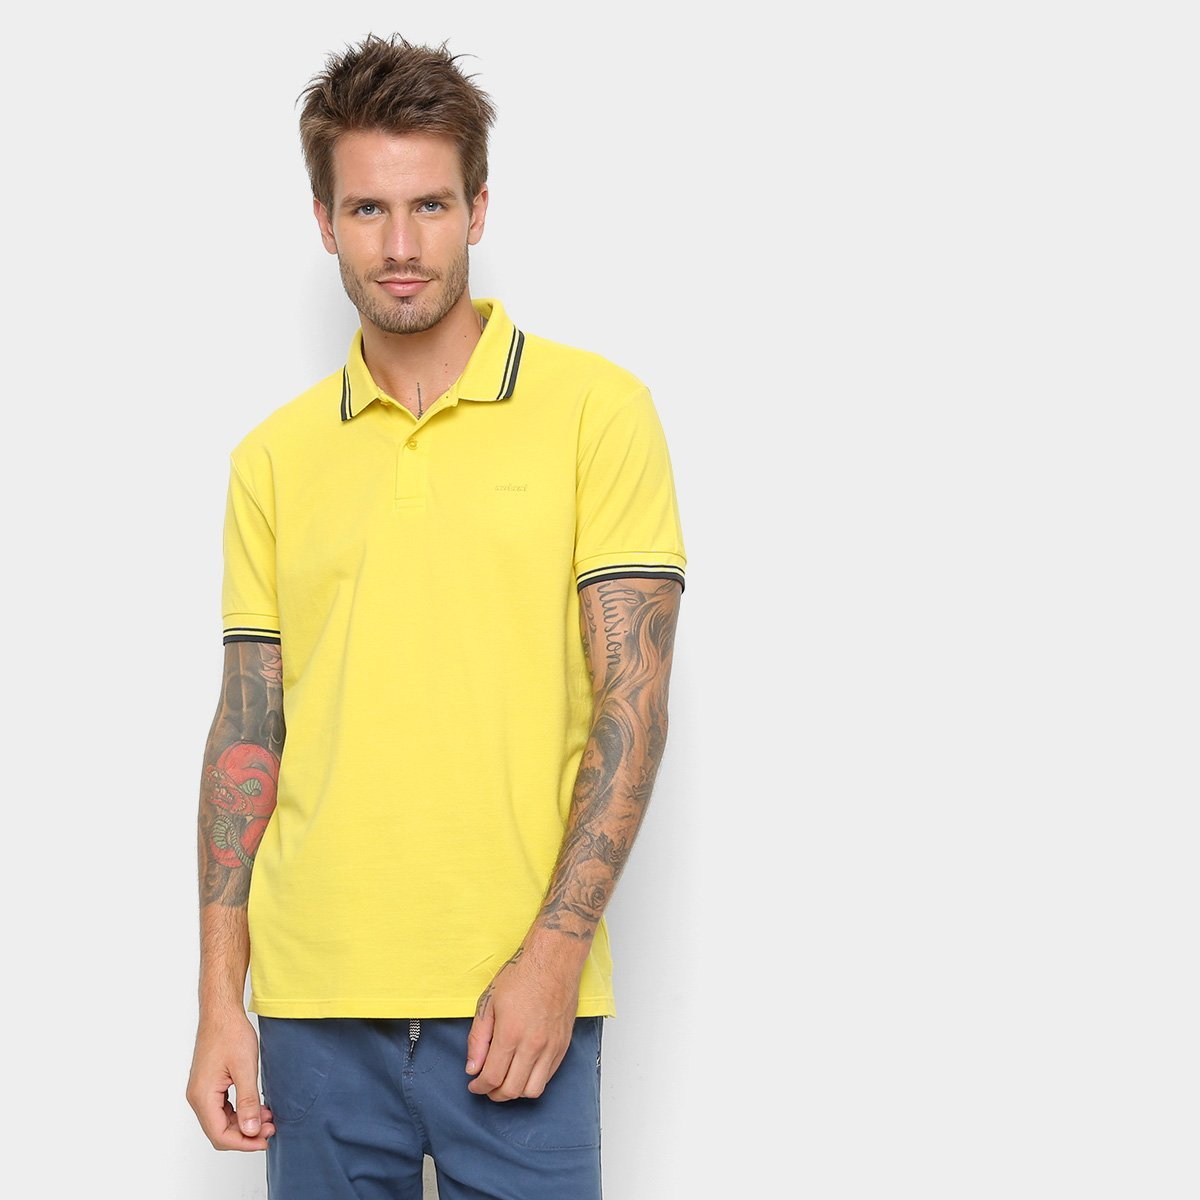 8daf7b2b0 Camisa Polo Colcci Básica Masculina